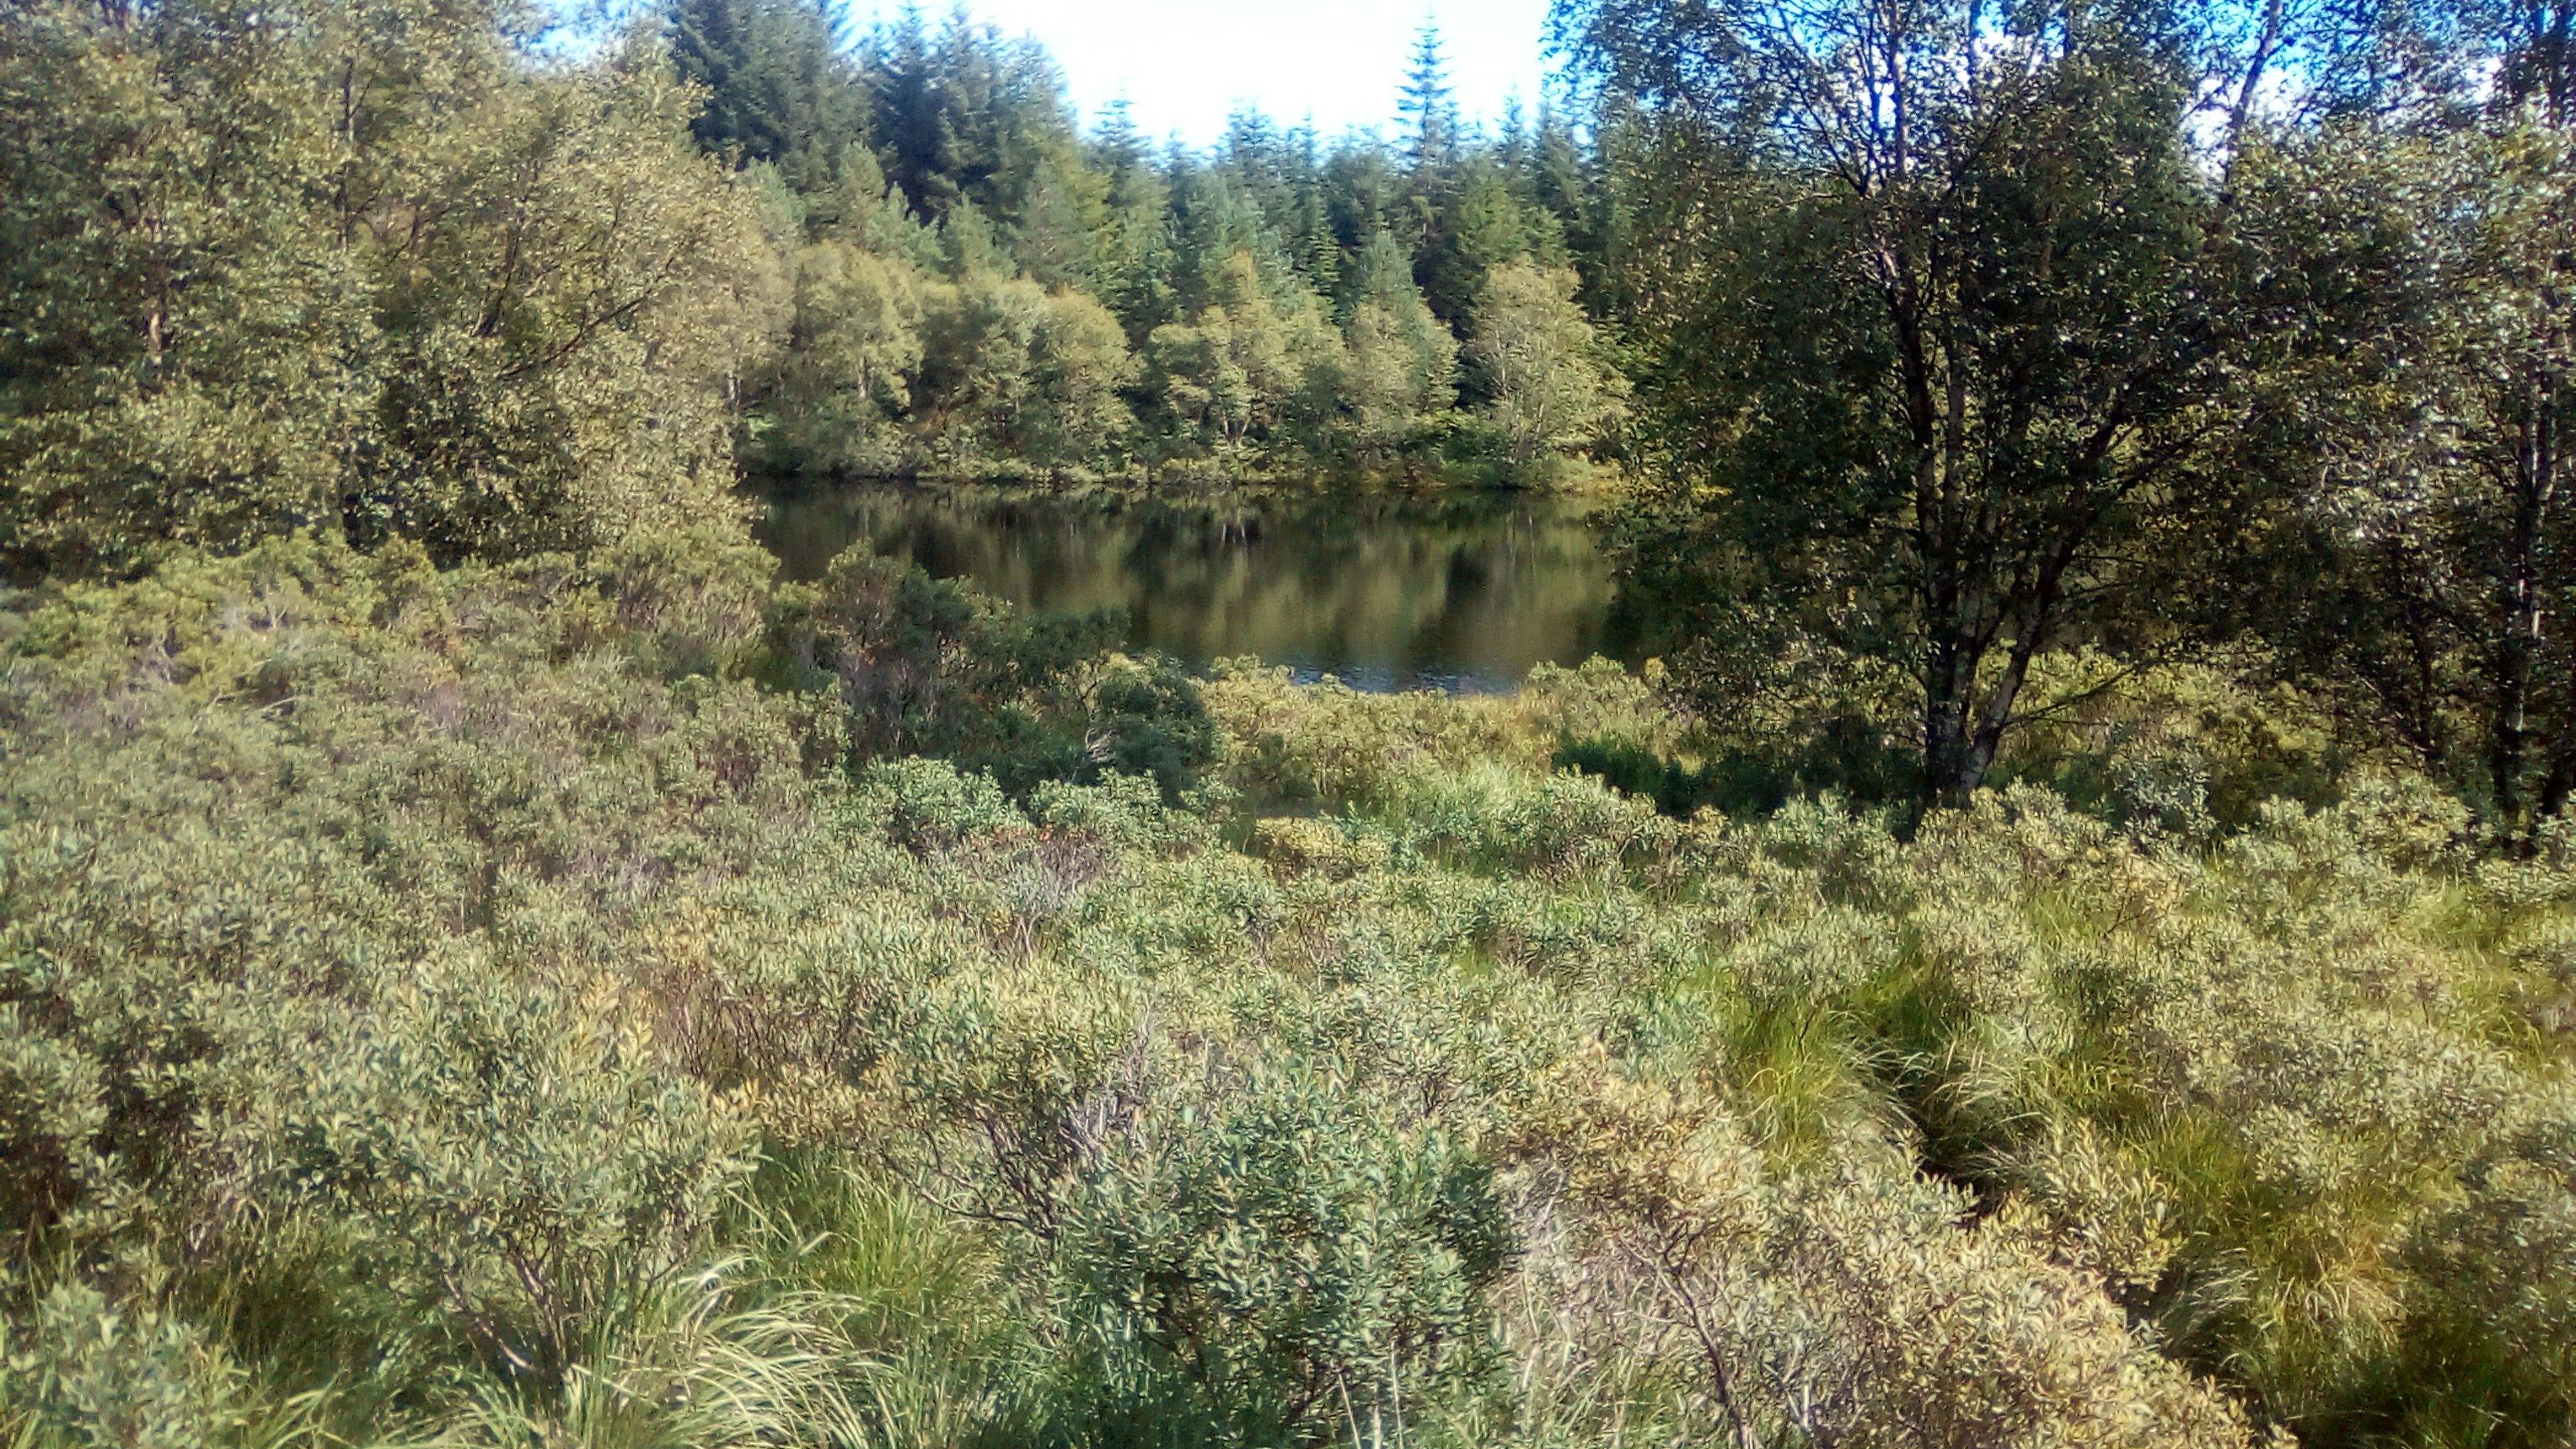 Small lake and trees